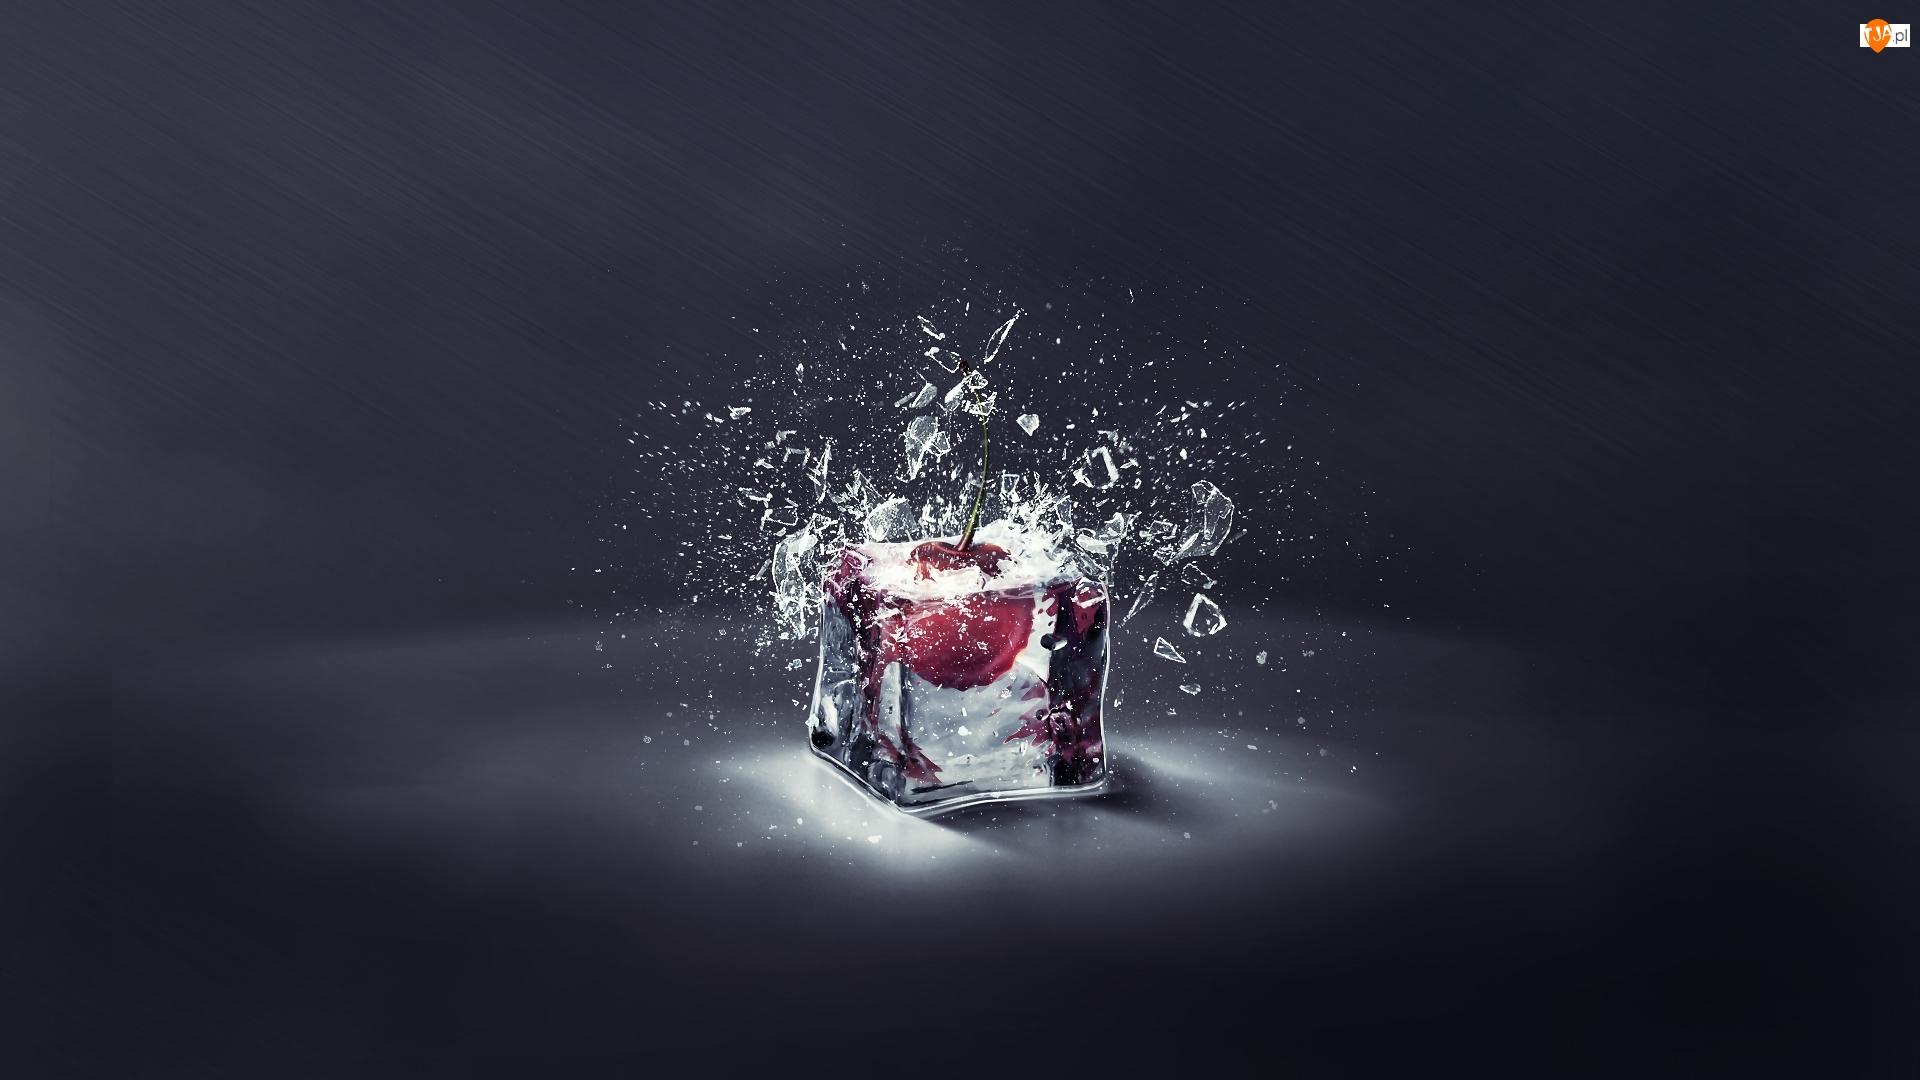 Wiśnia, Grafika 3D, Lód